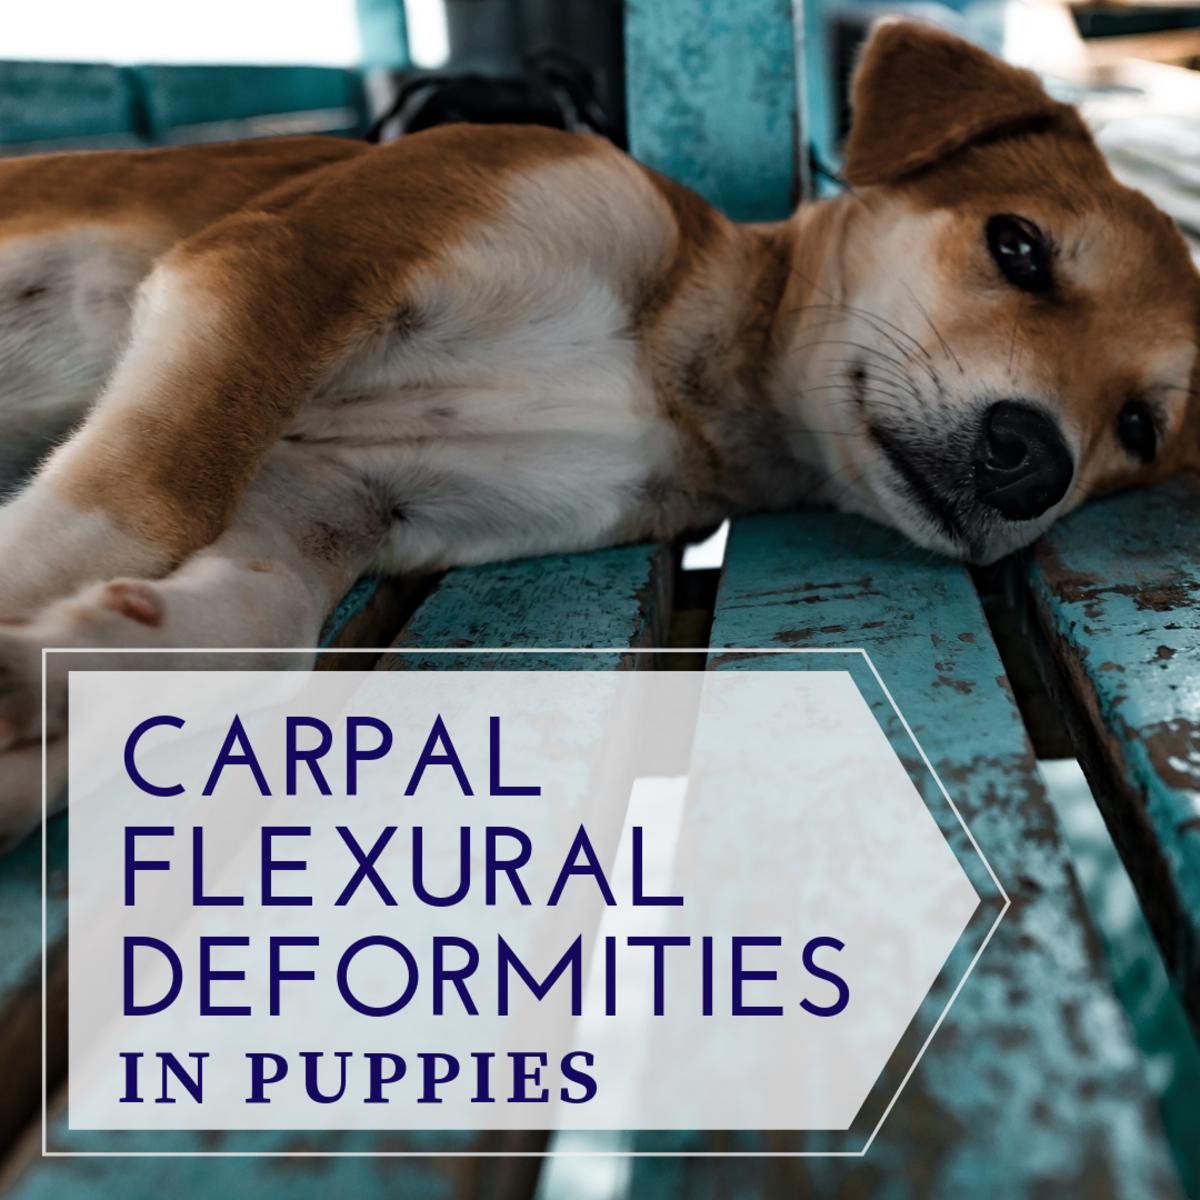 Carpal Flexural Deformities in Puppies